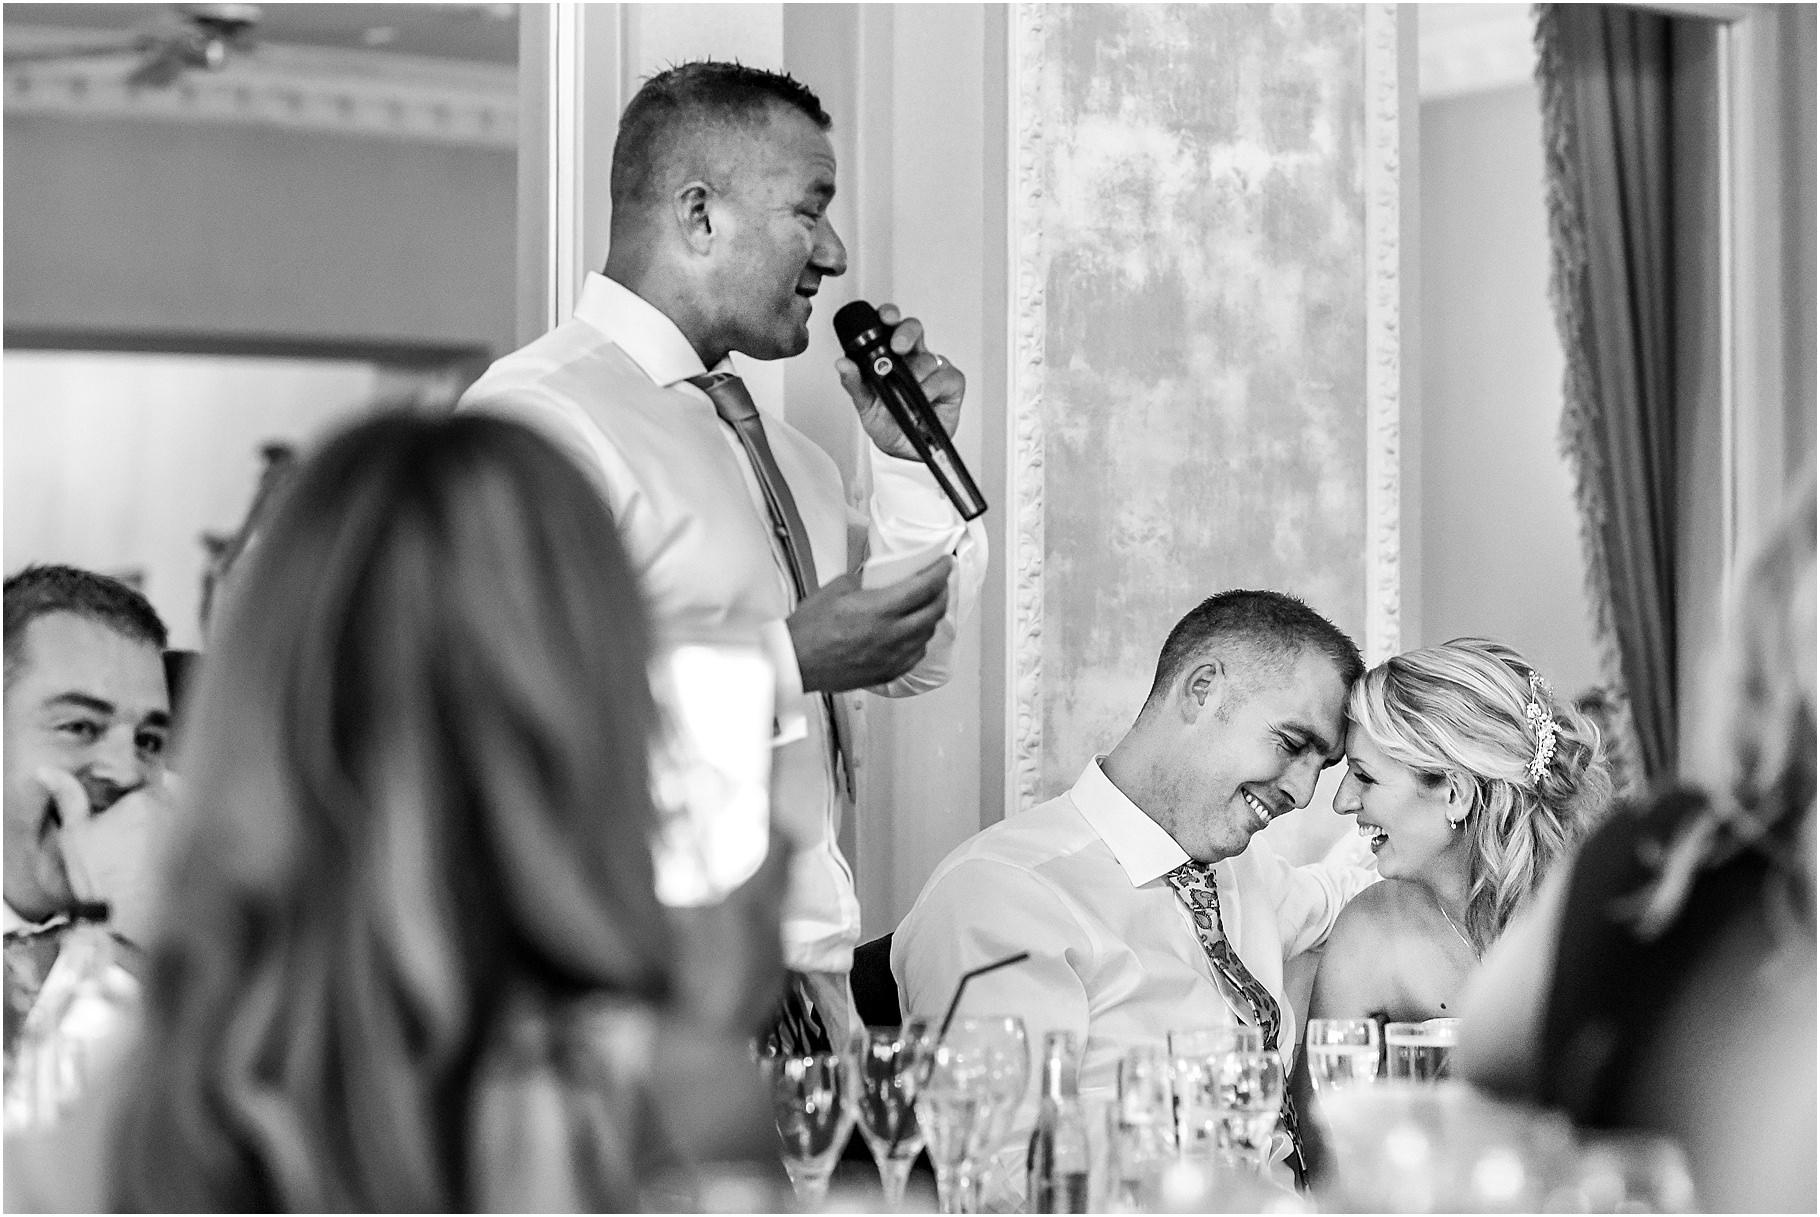 dan-wootton-photography-2017-weddings-166.jpg